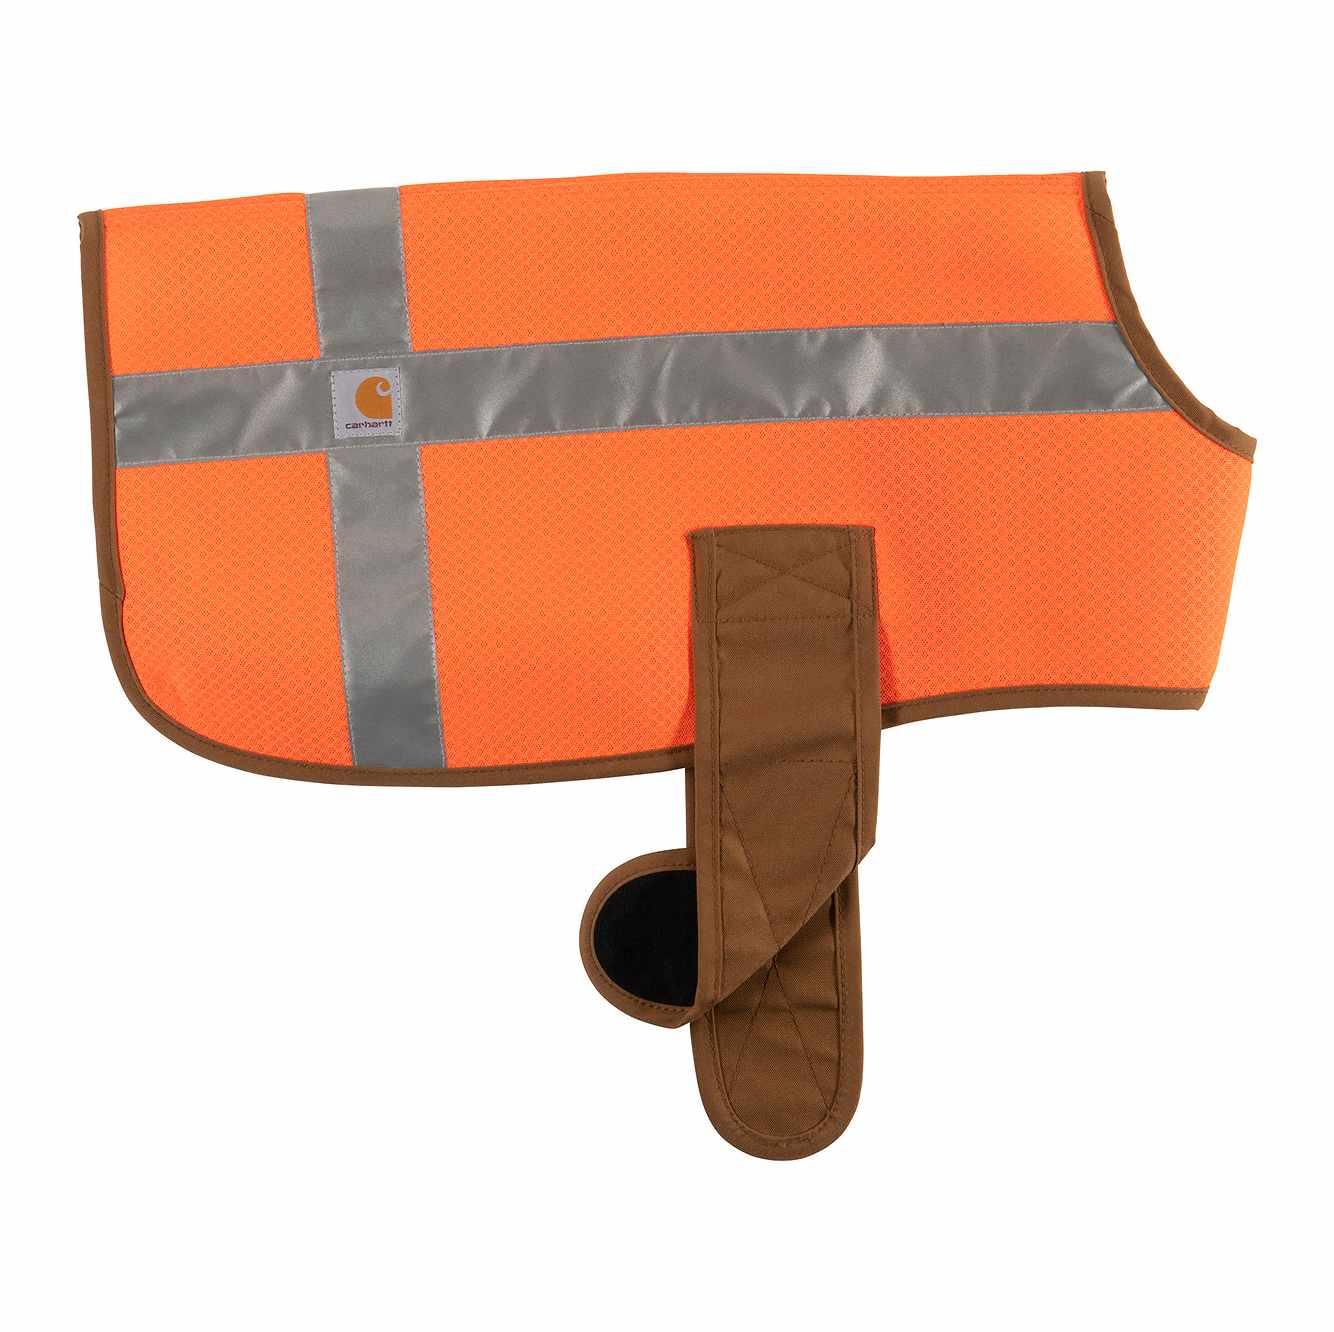 Picture of Safety Vest in Hunter Orange